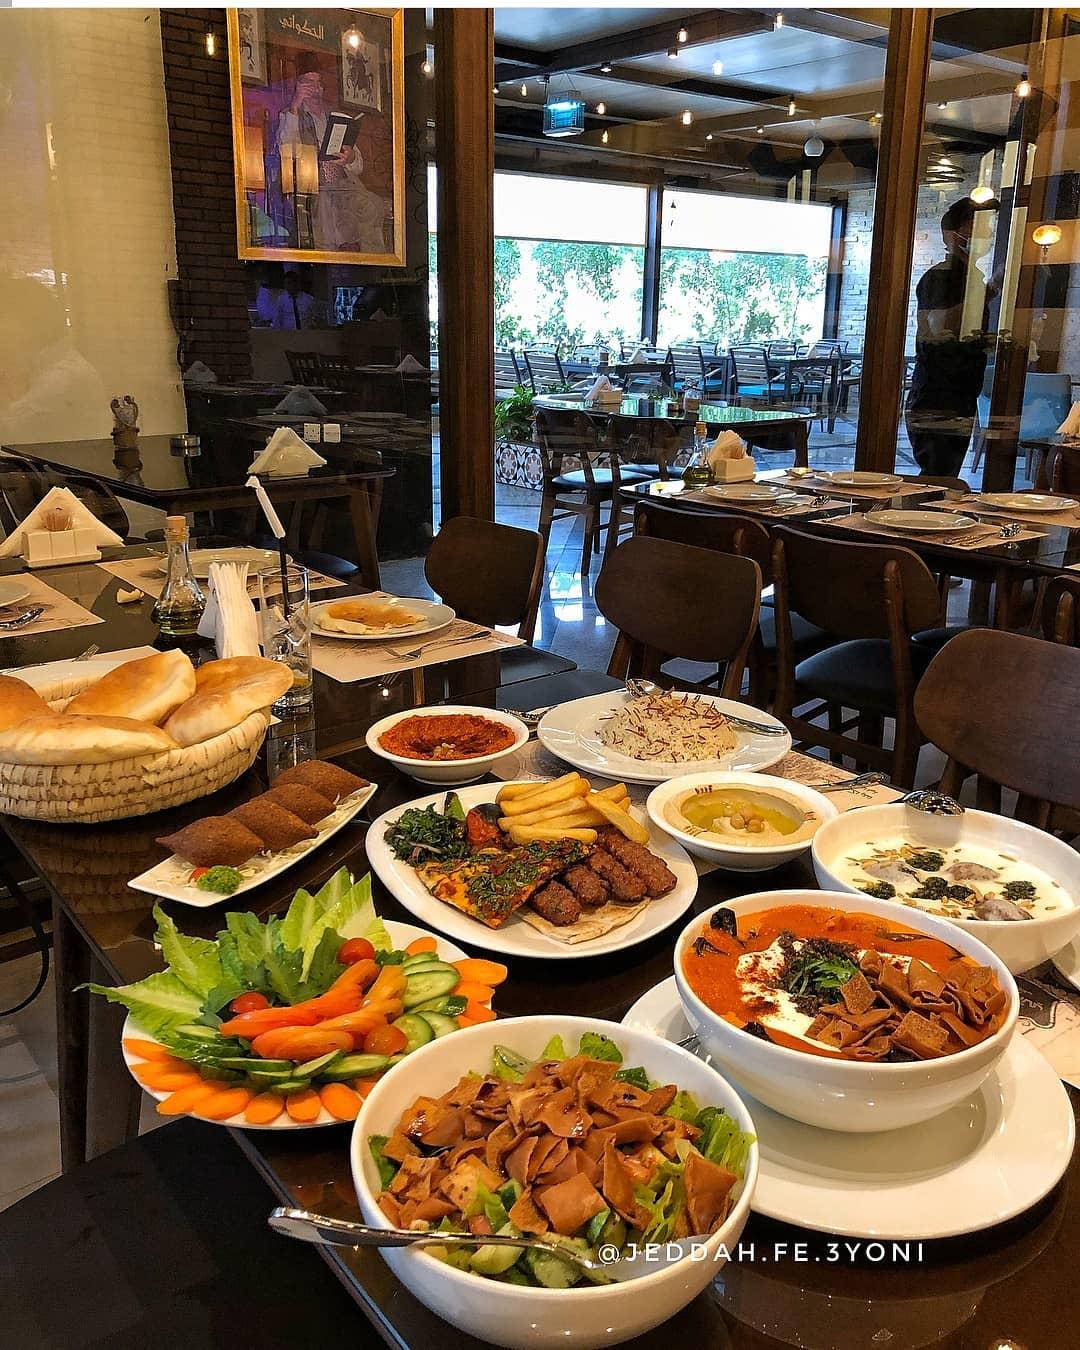 بالصور افضل مطاعم جدة , صور اشهر مطاعم في جدة 12907 9